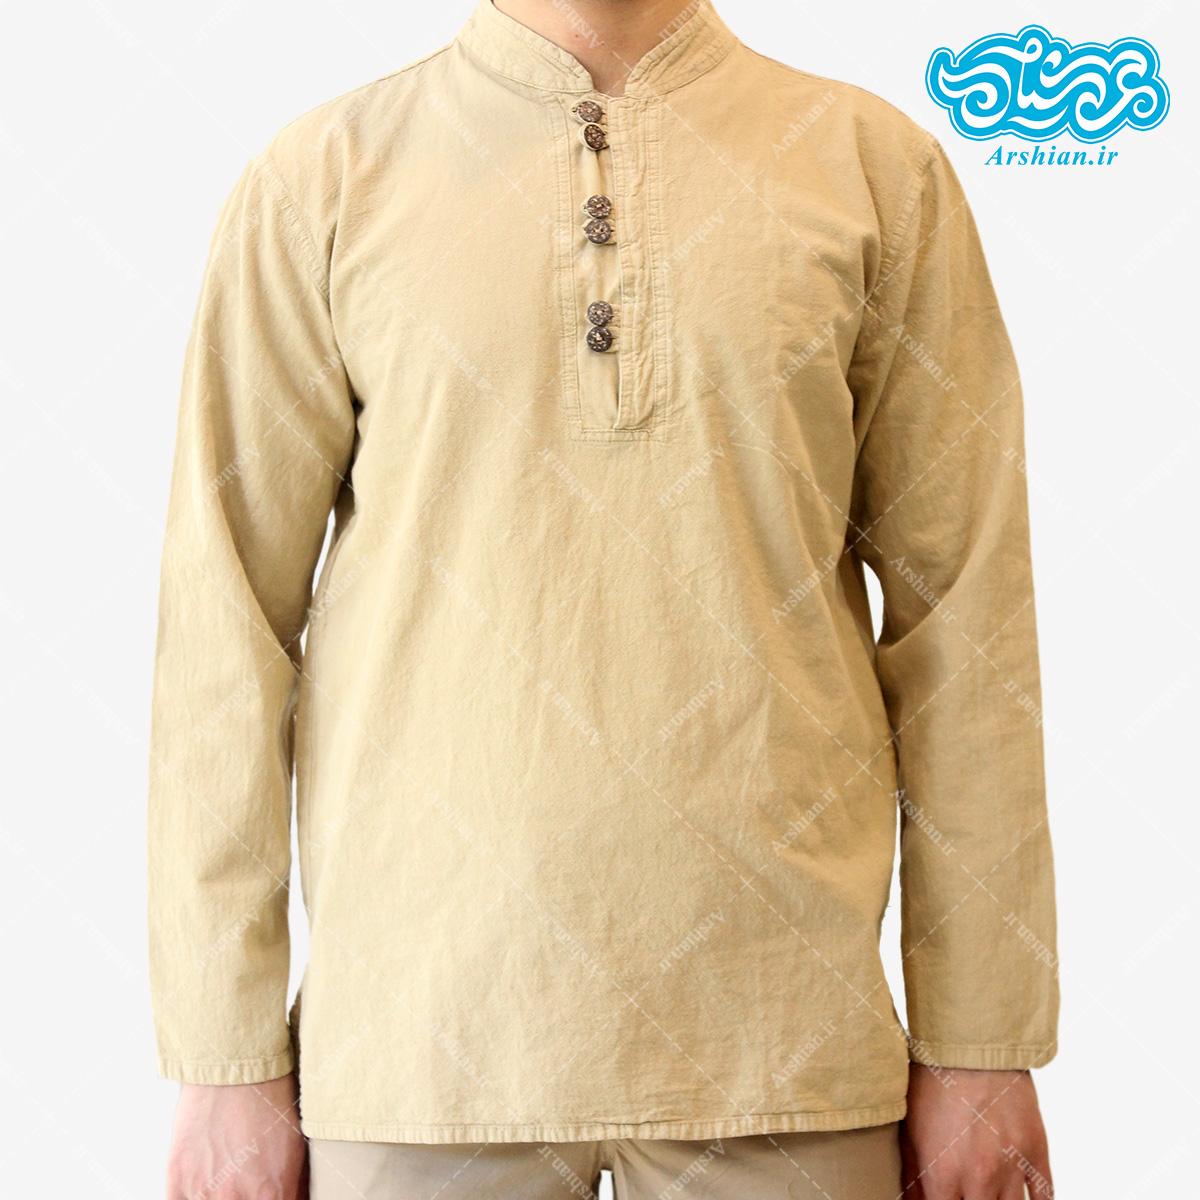 پیراهن الیاف طبیعی طرح شش دکمه مدل k001